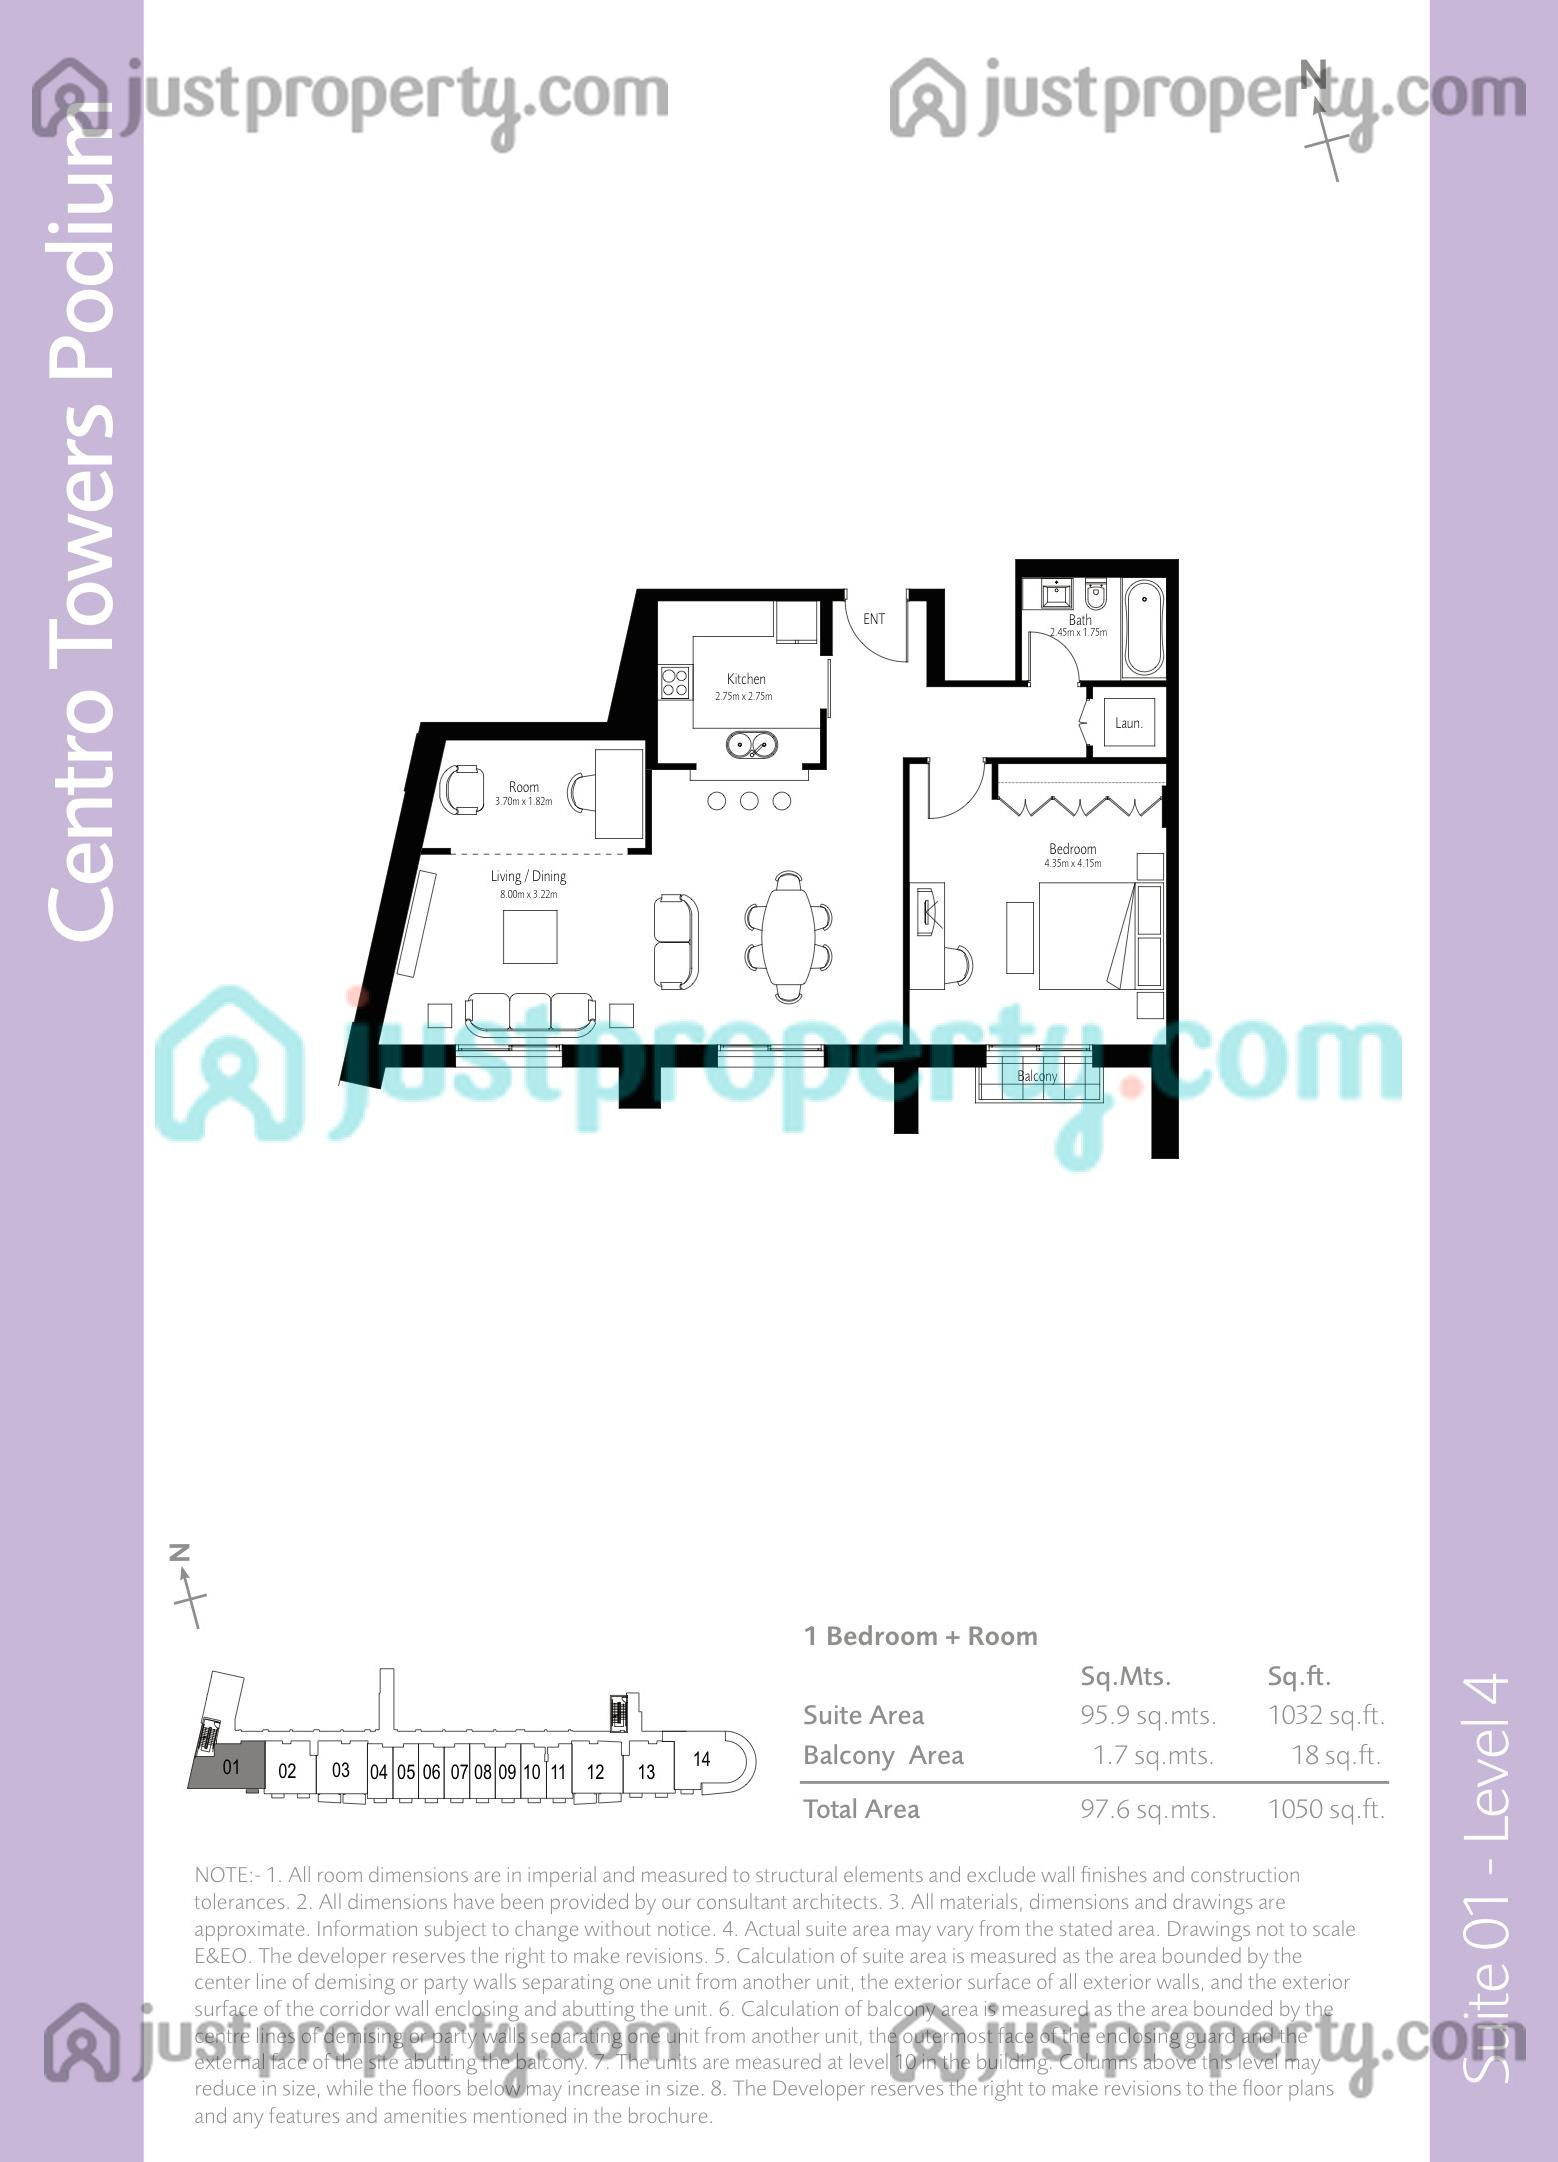 Boulevard Central Podium Floor Plans   JustProperty.com